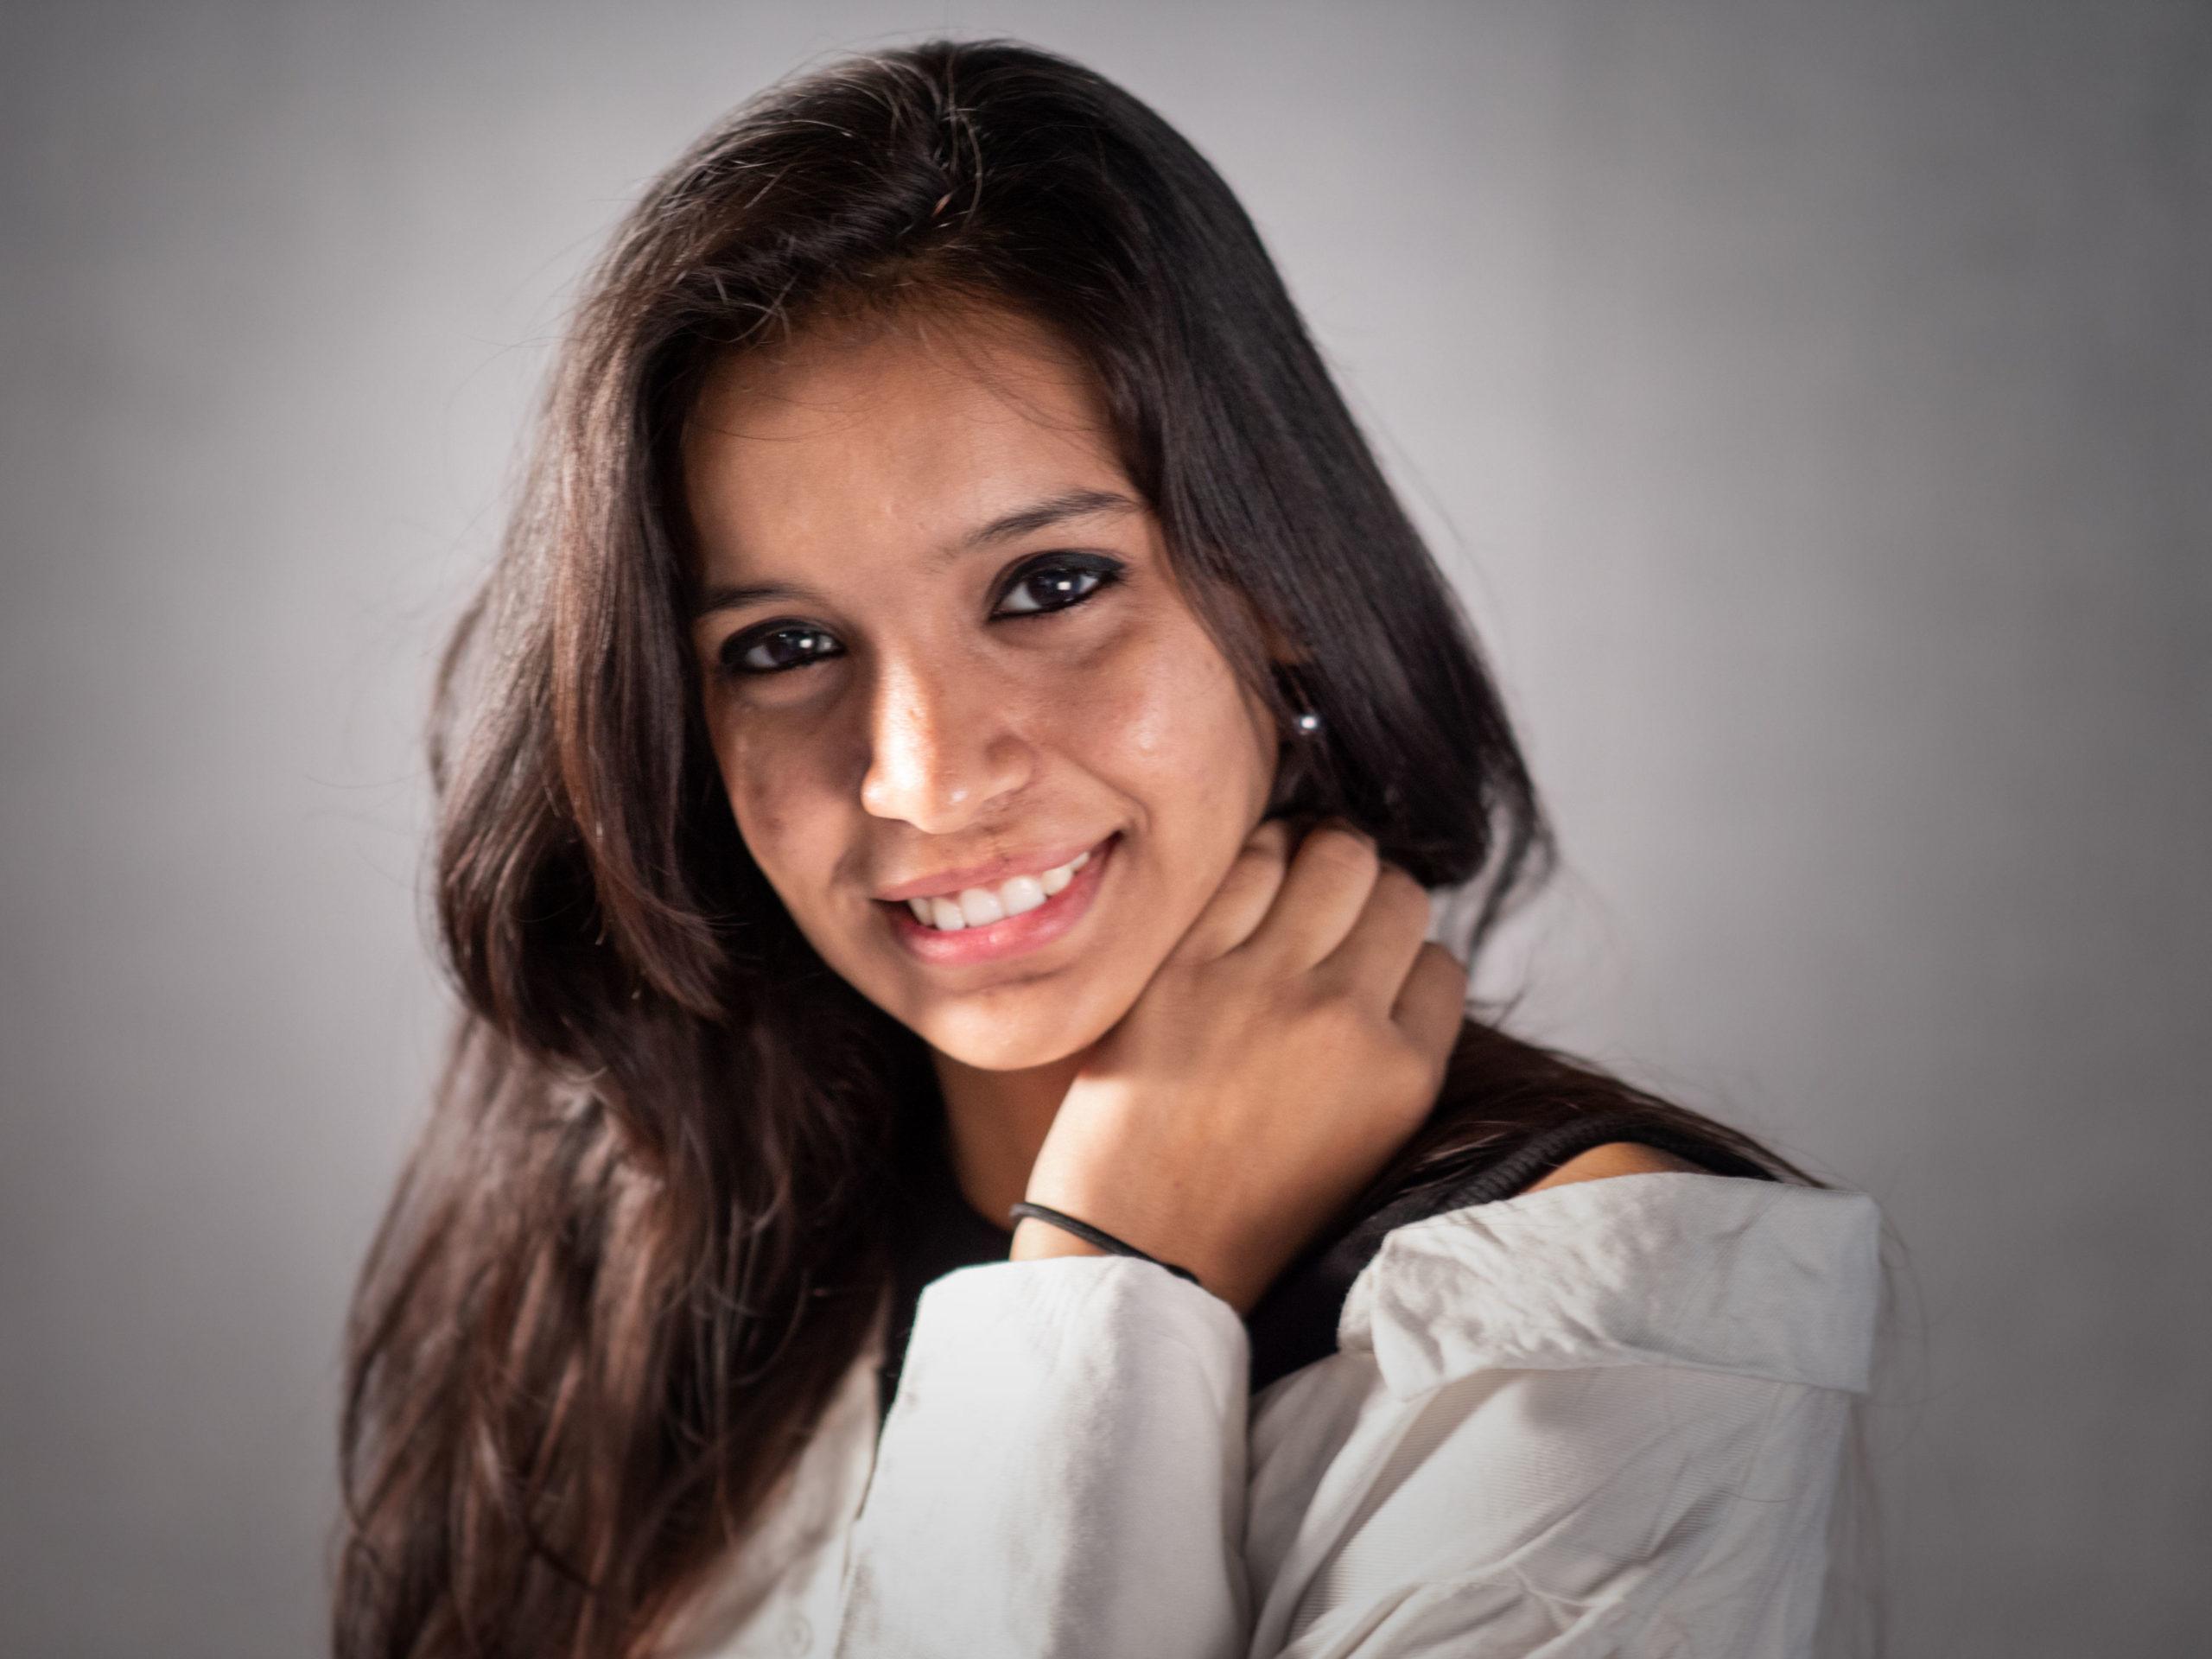 Radhika Chaudhary